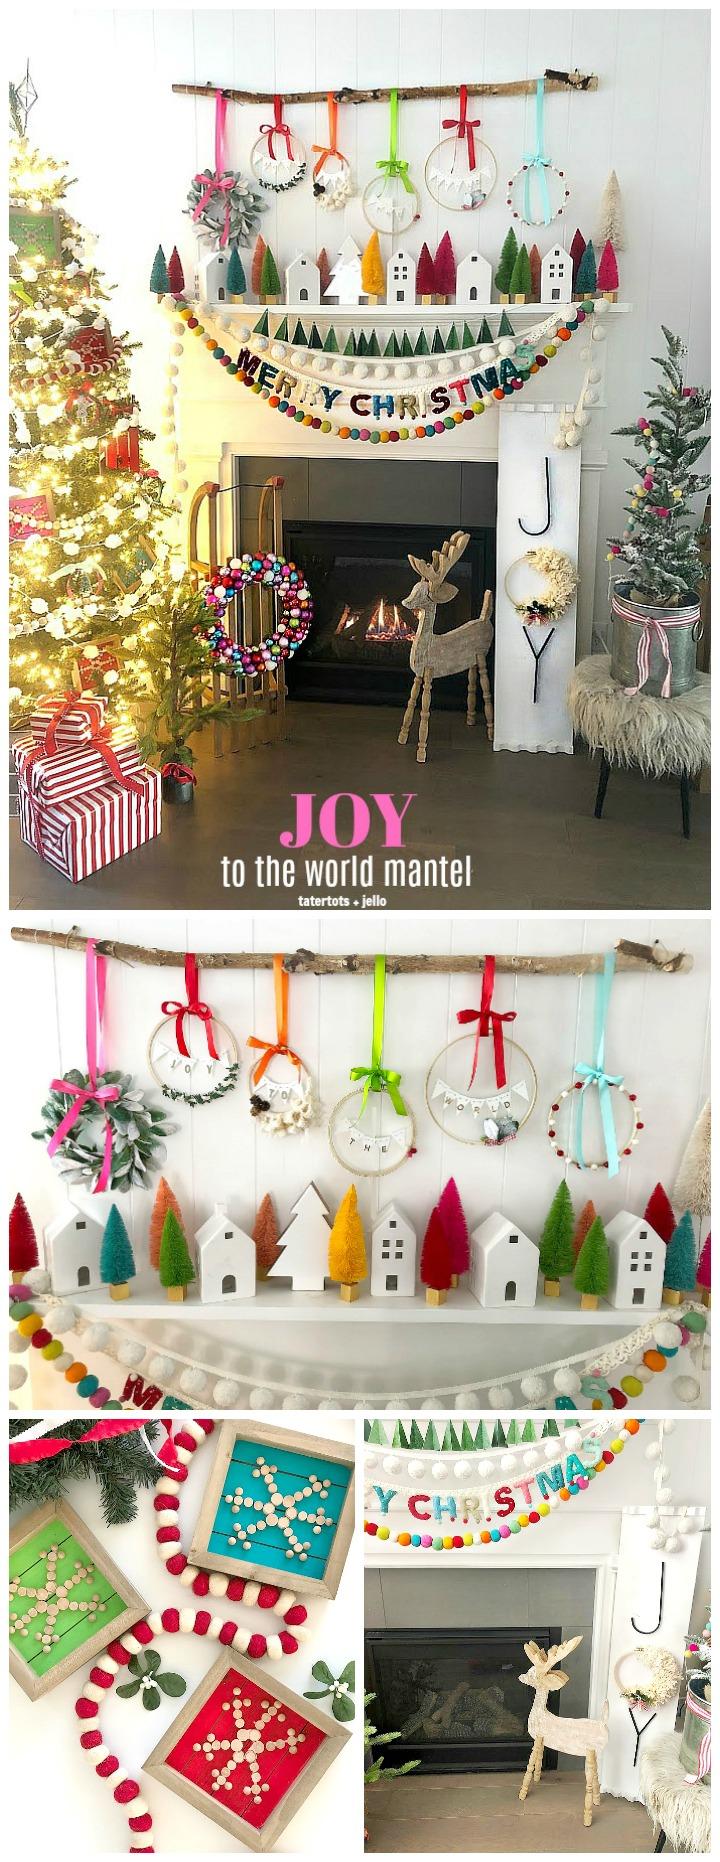 Joy to the World mantel - DIY Joy sign, embroidery hoop wreaths and DIY scandinavian snowflake ornaments.